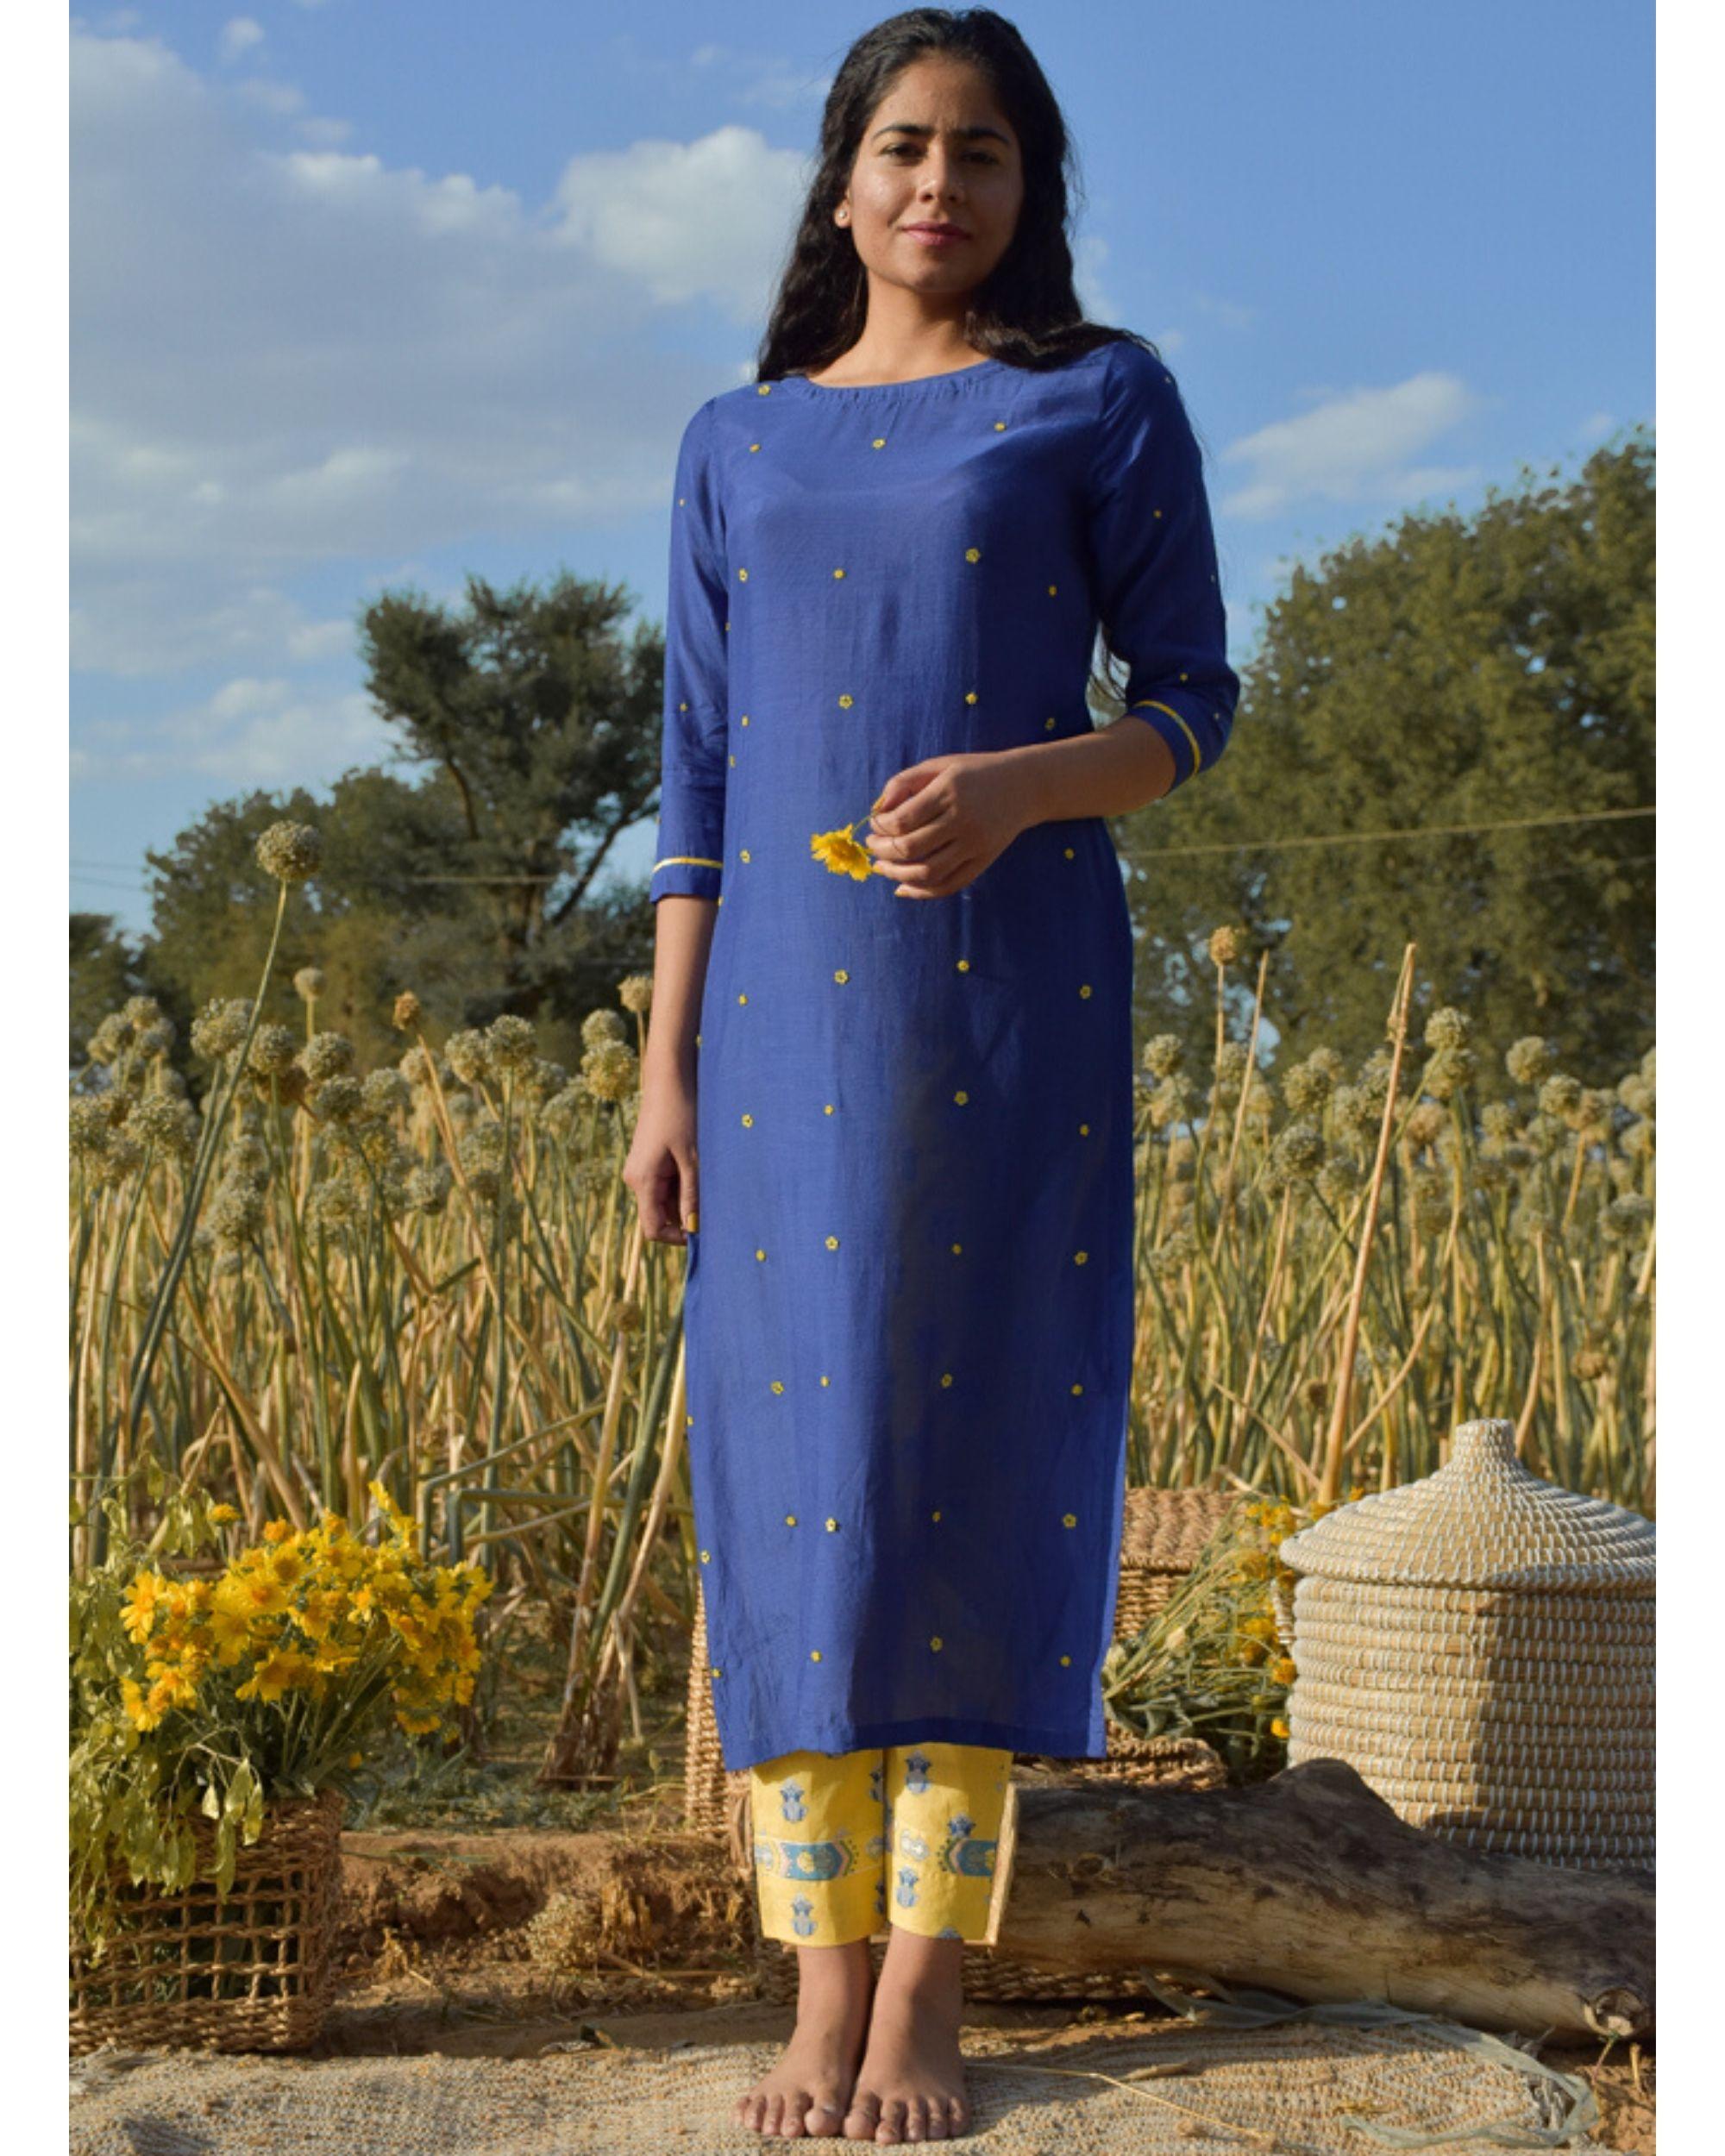 Blue and yellow embroidered kurta